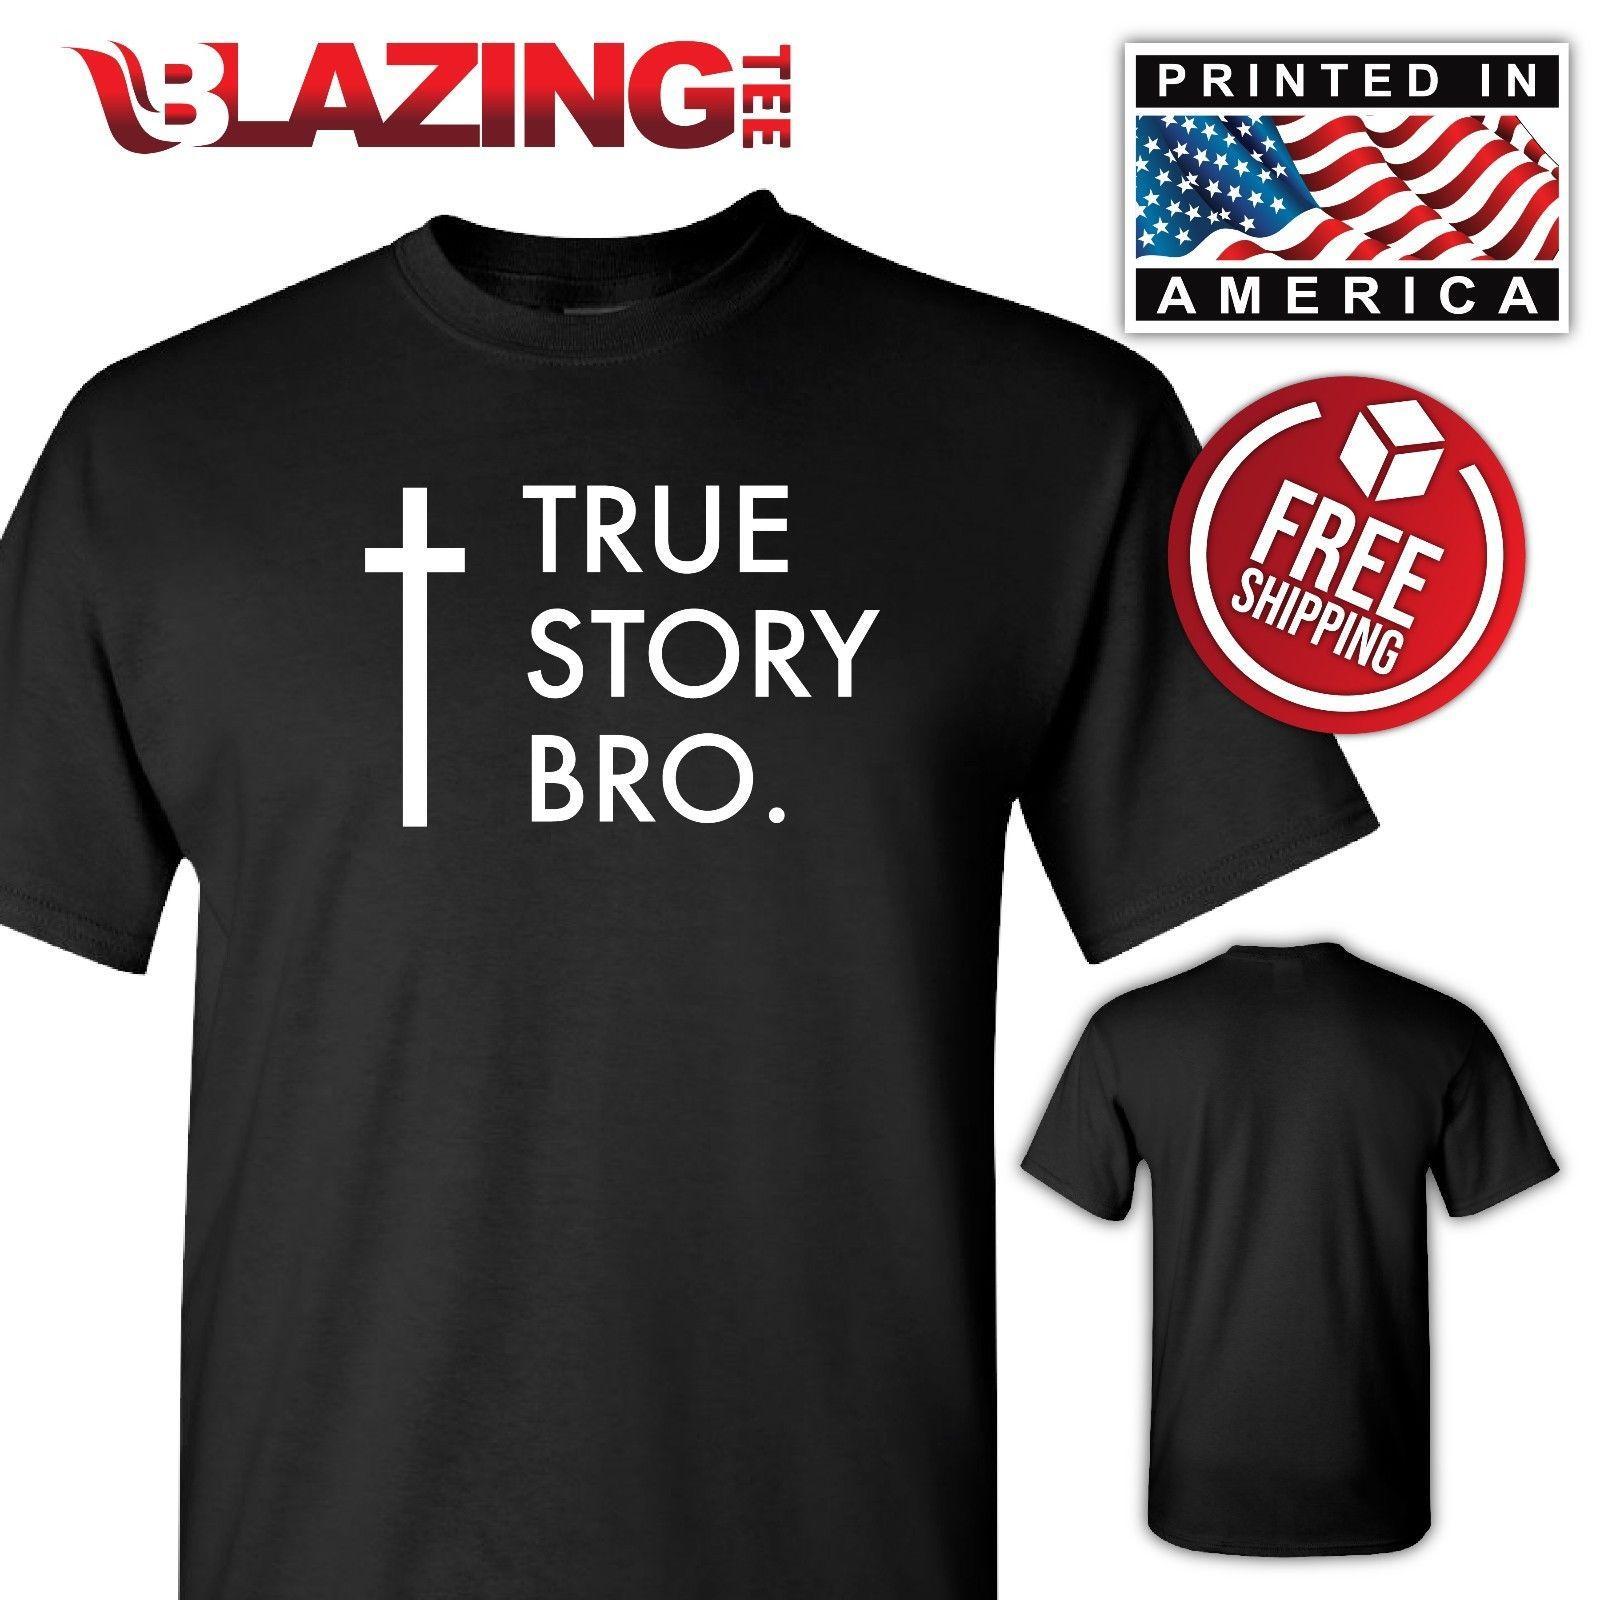 418dd343643 TRUE STORY BRO Christian Cool T Shirt Religious Jesus Cross Bible Shirt Sm  3Xl Funny Unisex Casual Tee Gift Top Tshirt Tshirts From Universal fashion